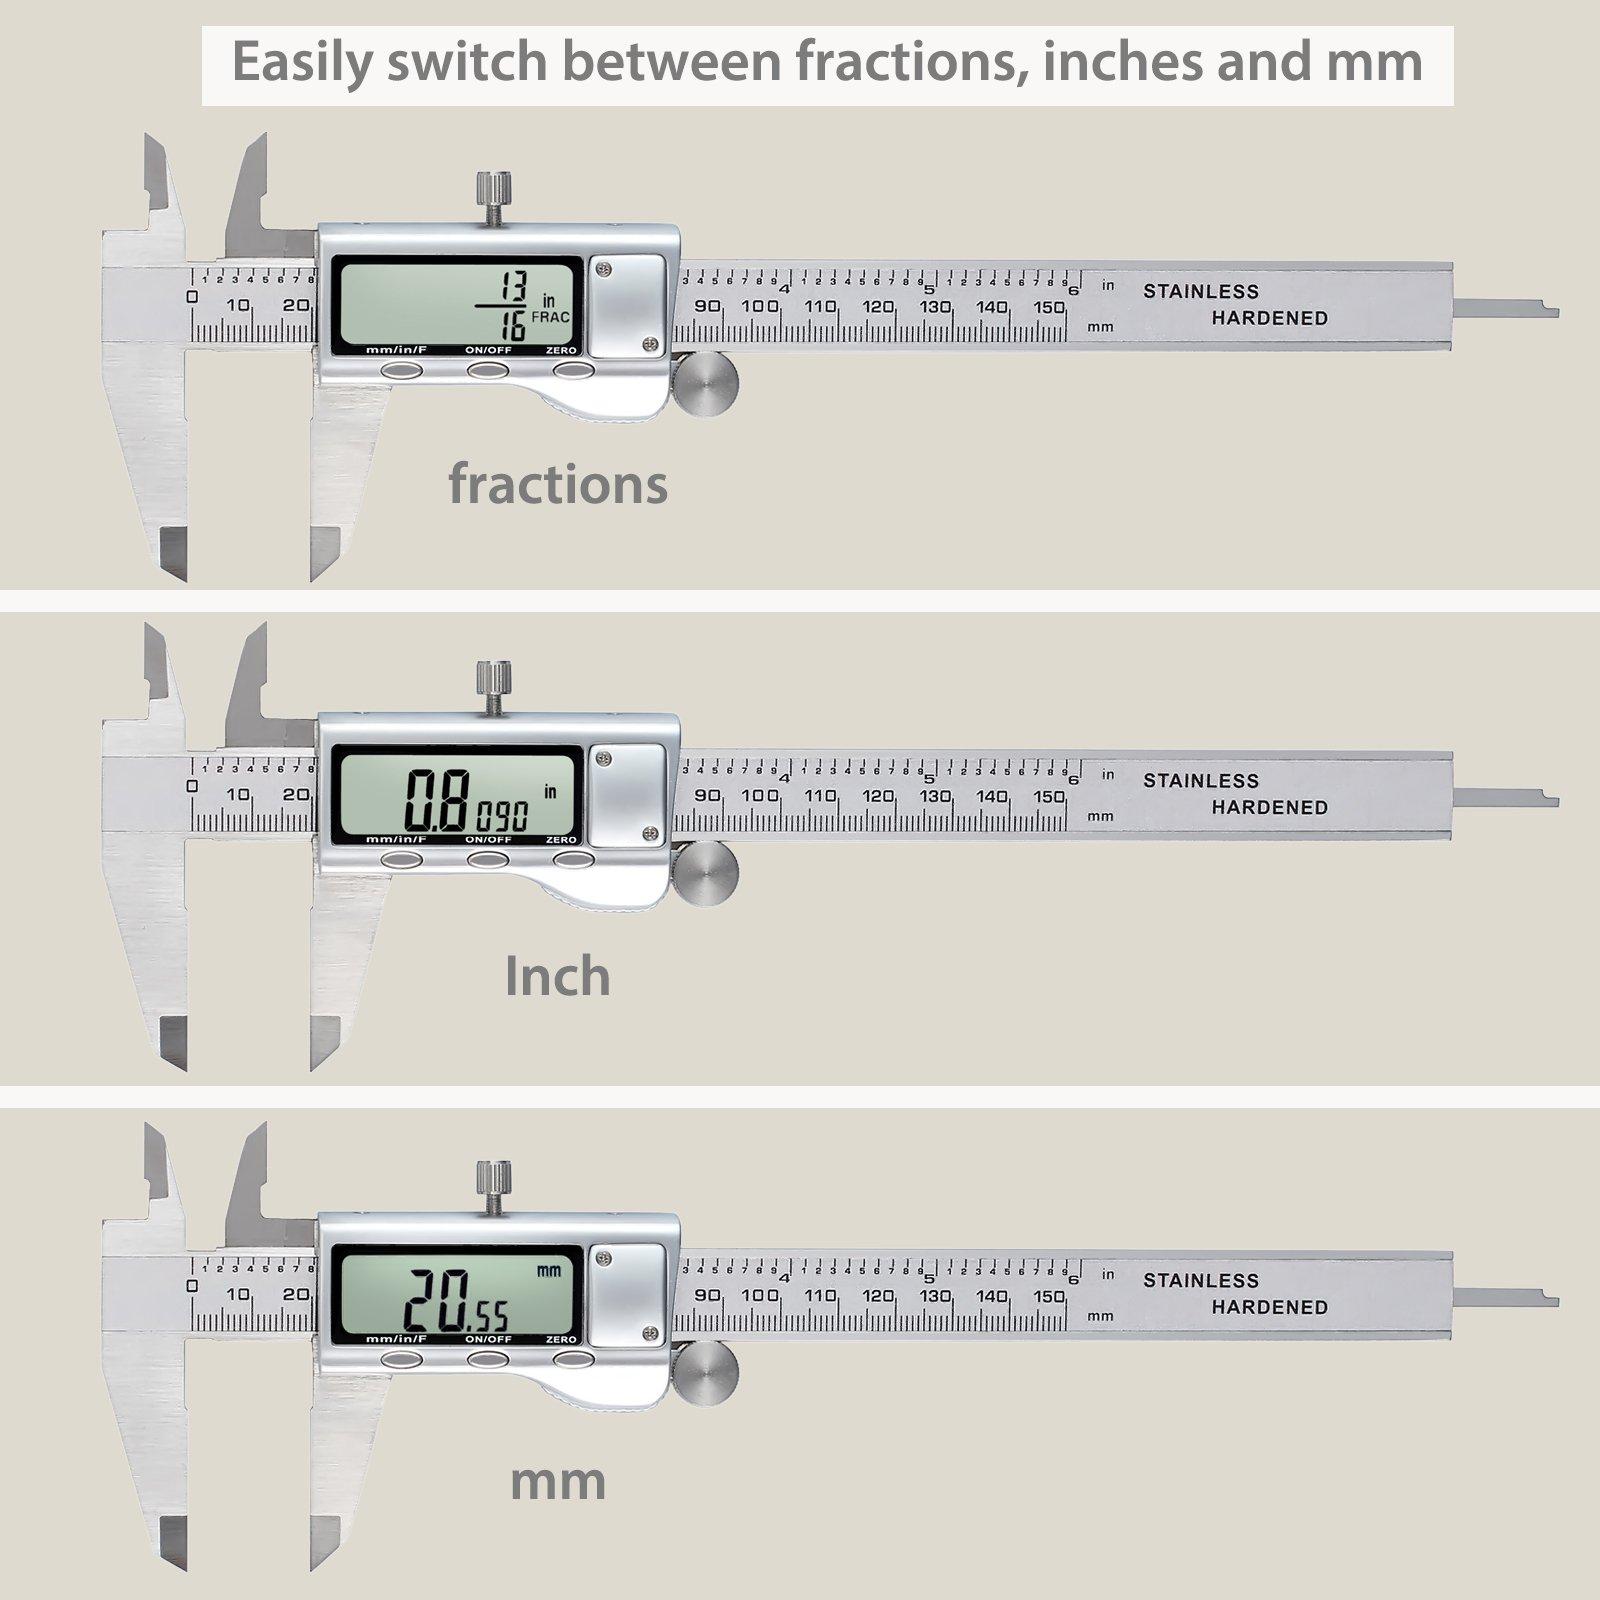 Digital Vernier Caliper + Feeler Gauge Neoteck 150mm/6Inch Stainless Steel Electronic Caliper Fractions/Inch/Metric Conversion Measuring Tool for Length Width Depth Inner Diameter Outer Diameter by Neoteck (Image #5)